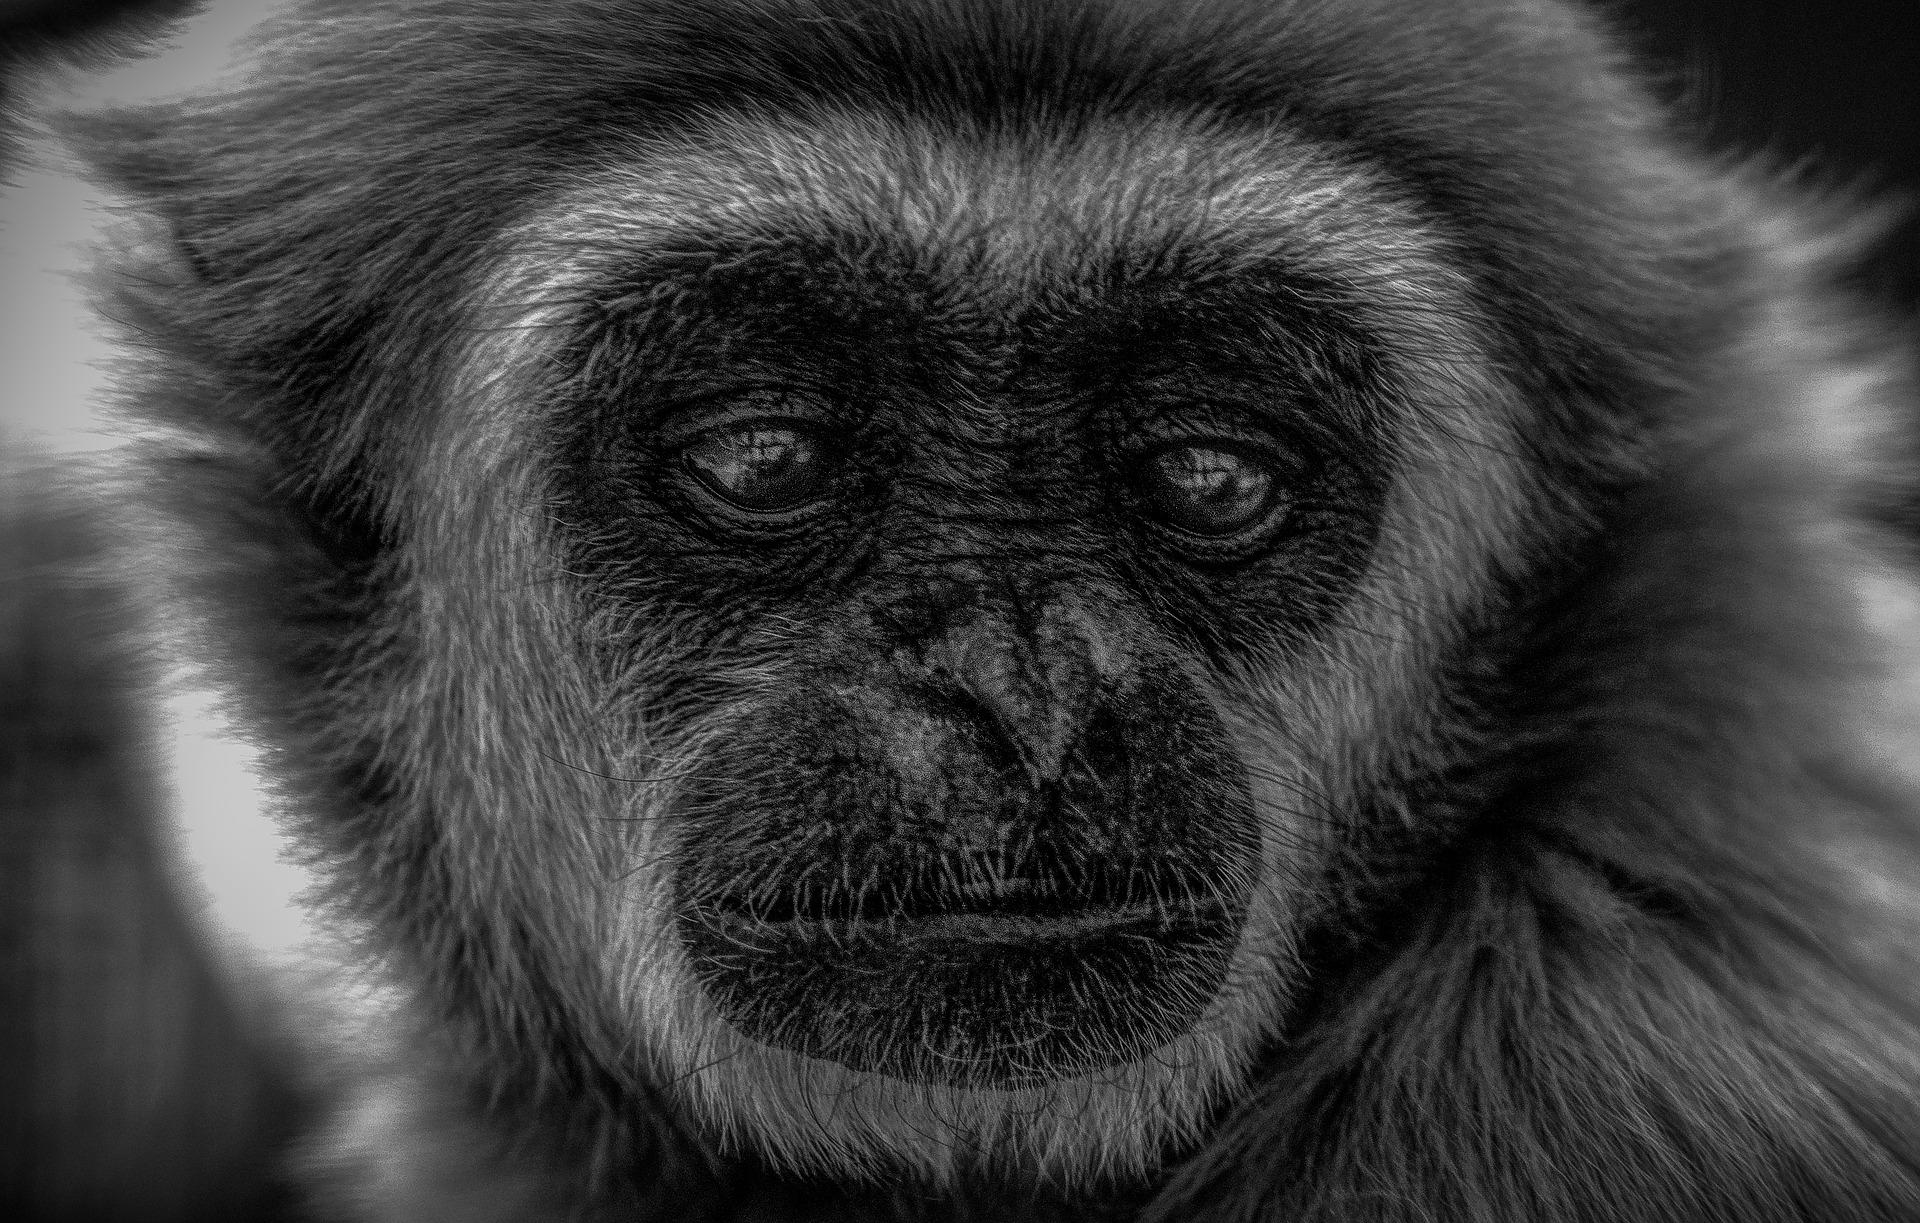 Primatologia-zoologia-ciencia-curiosidad-curiosidades-gibones-Hylobates-Hylobatidae-biodiversidad